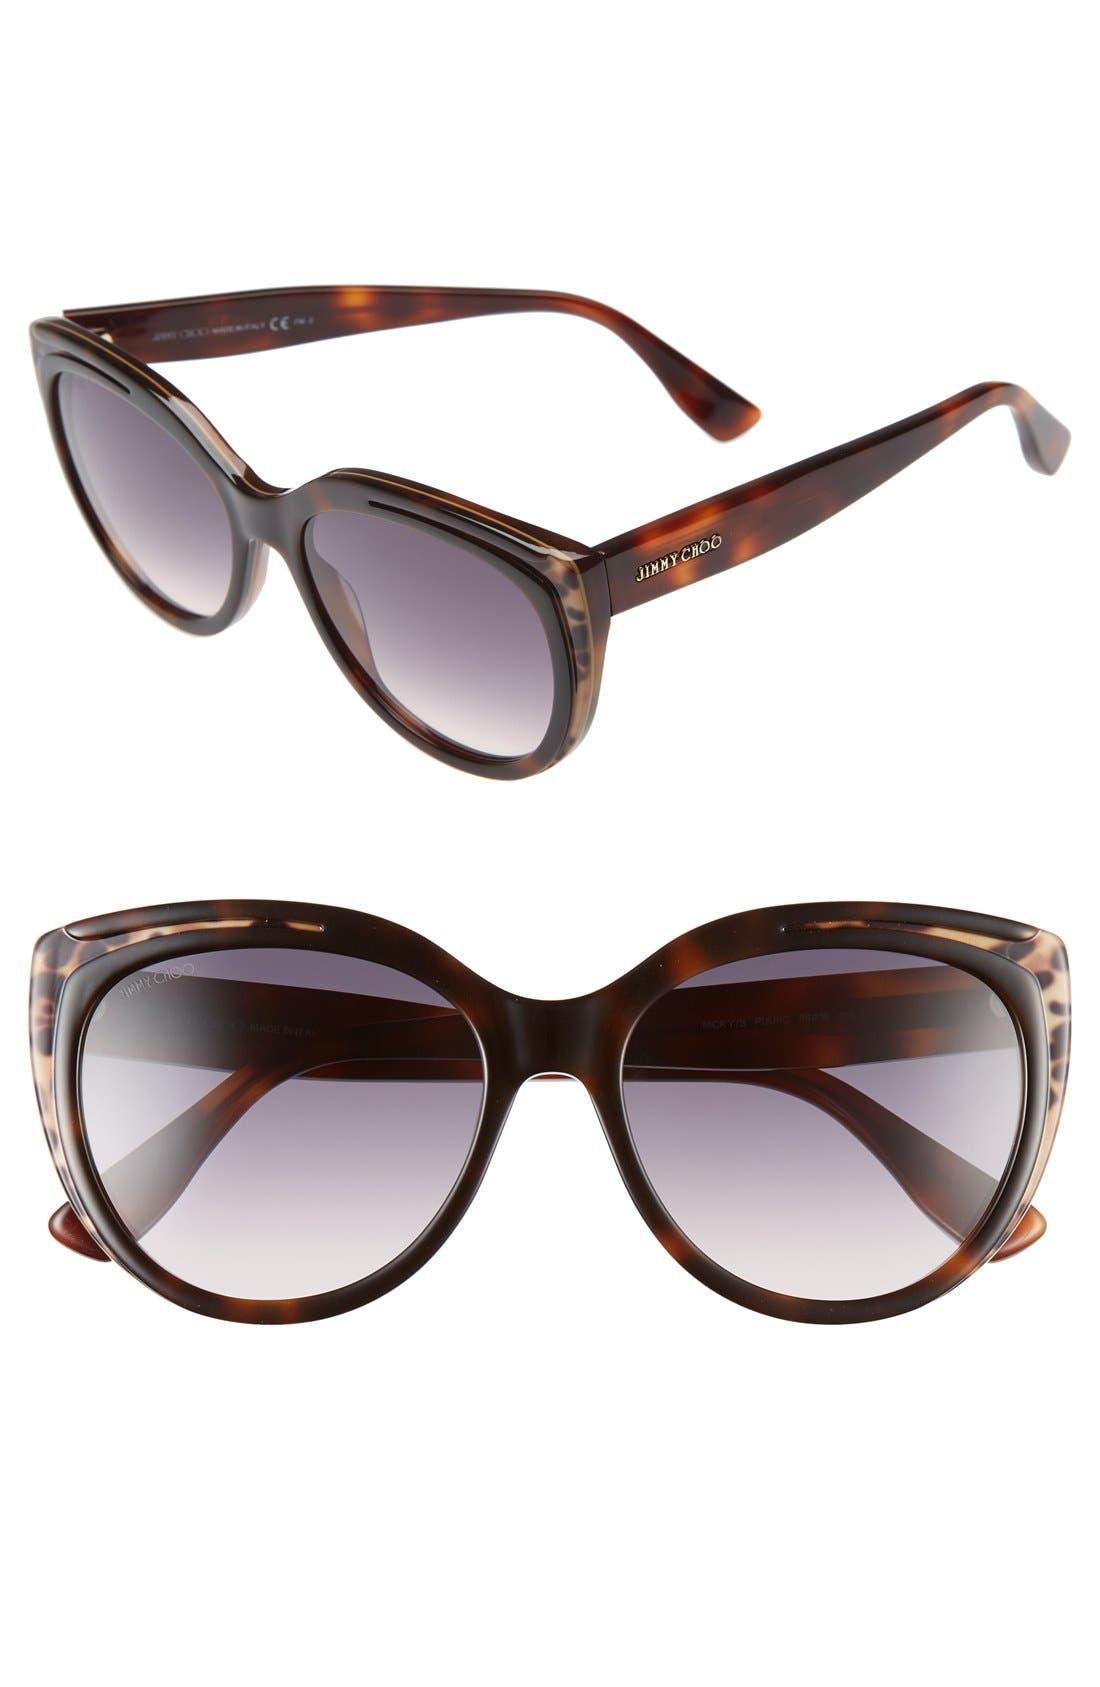 Main Image - Jimmy Choo 'Nicky' 56mm Cat Eye Sunglasses